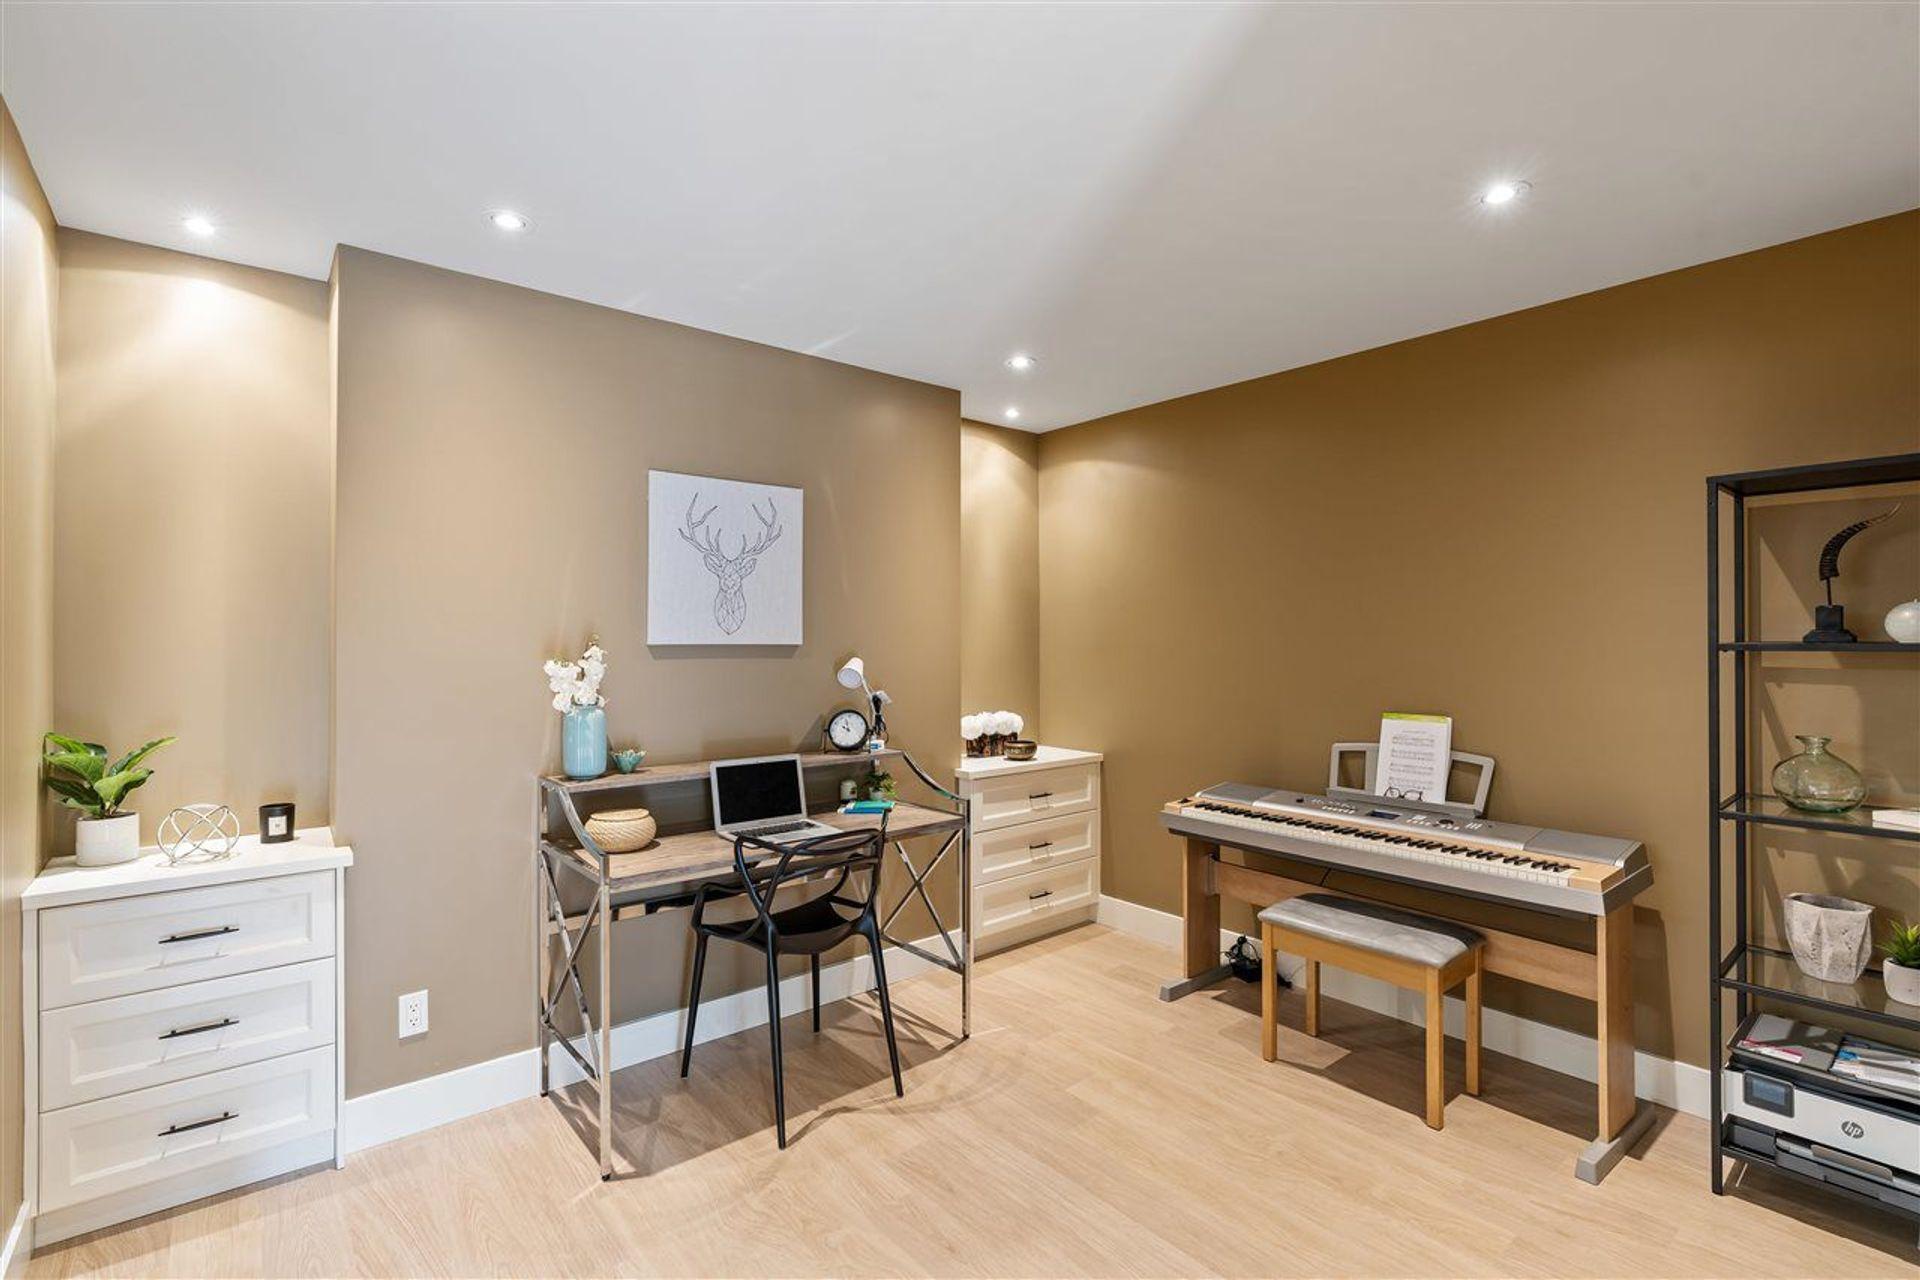 24852-ferguson-avenue-cottonwood-mr-maple-ridge-19 of 24852 Ferguson Avenue, Cottonwood MR, Maple Ridge